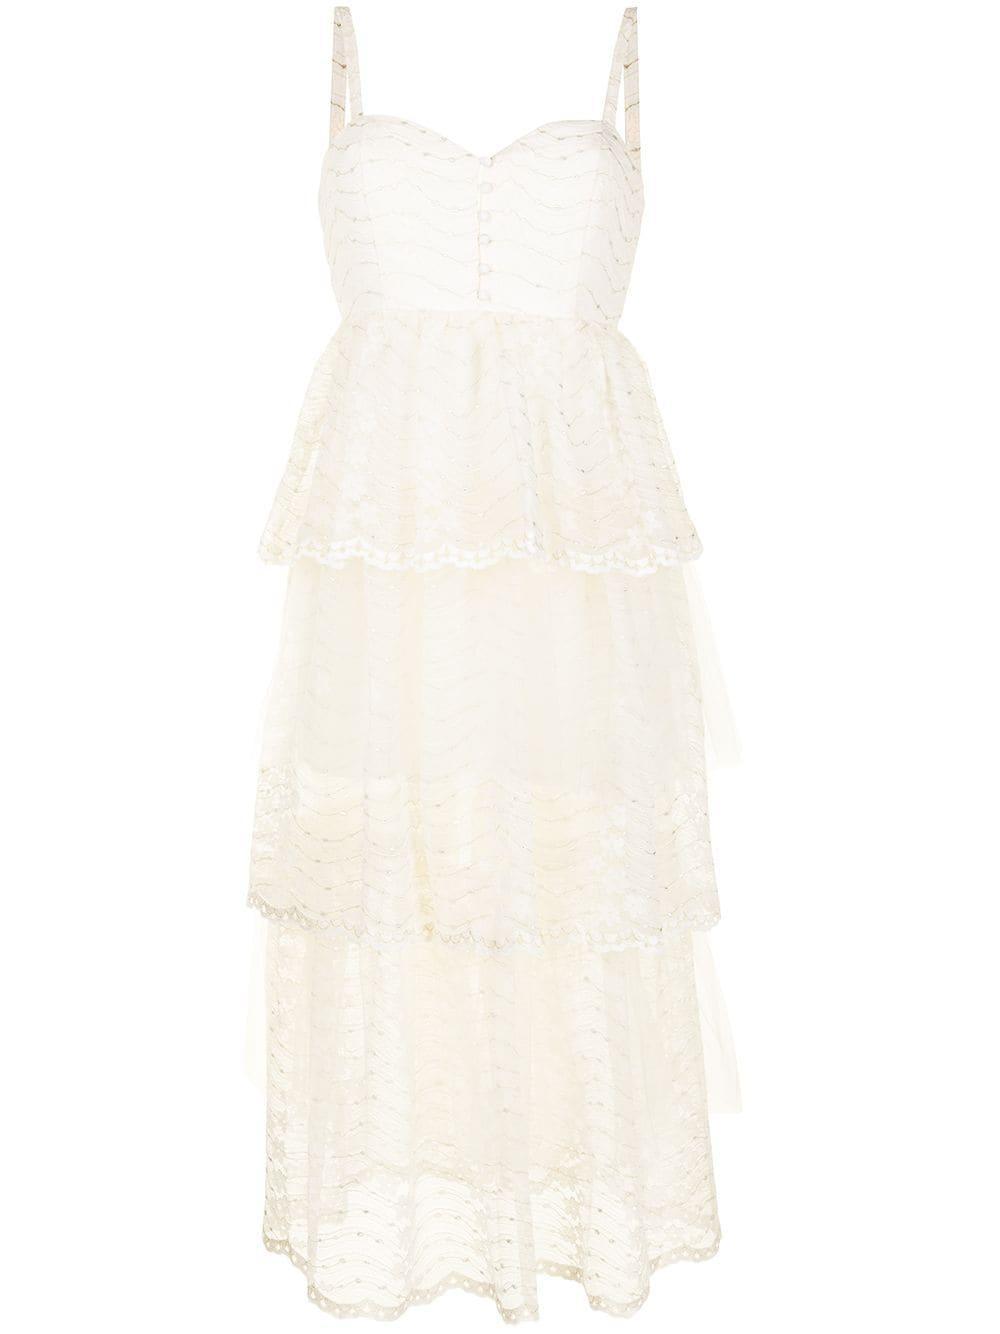 Moonstruck Midi Dress